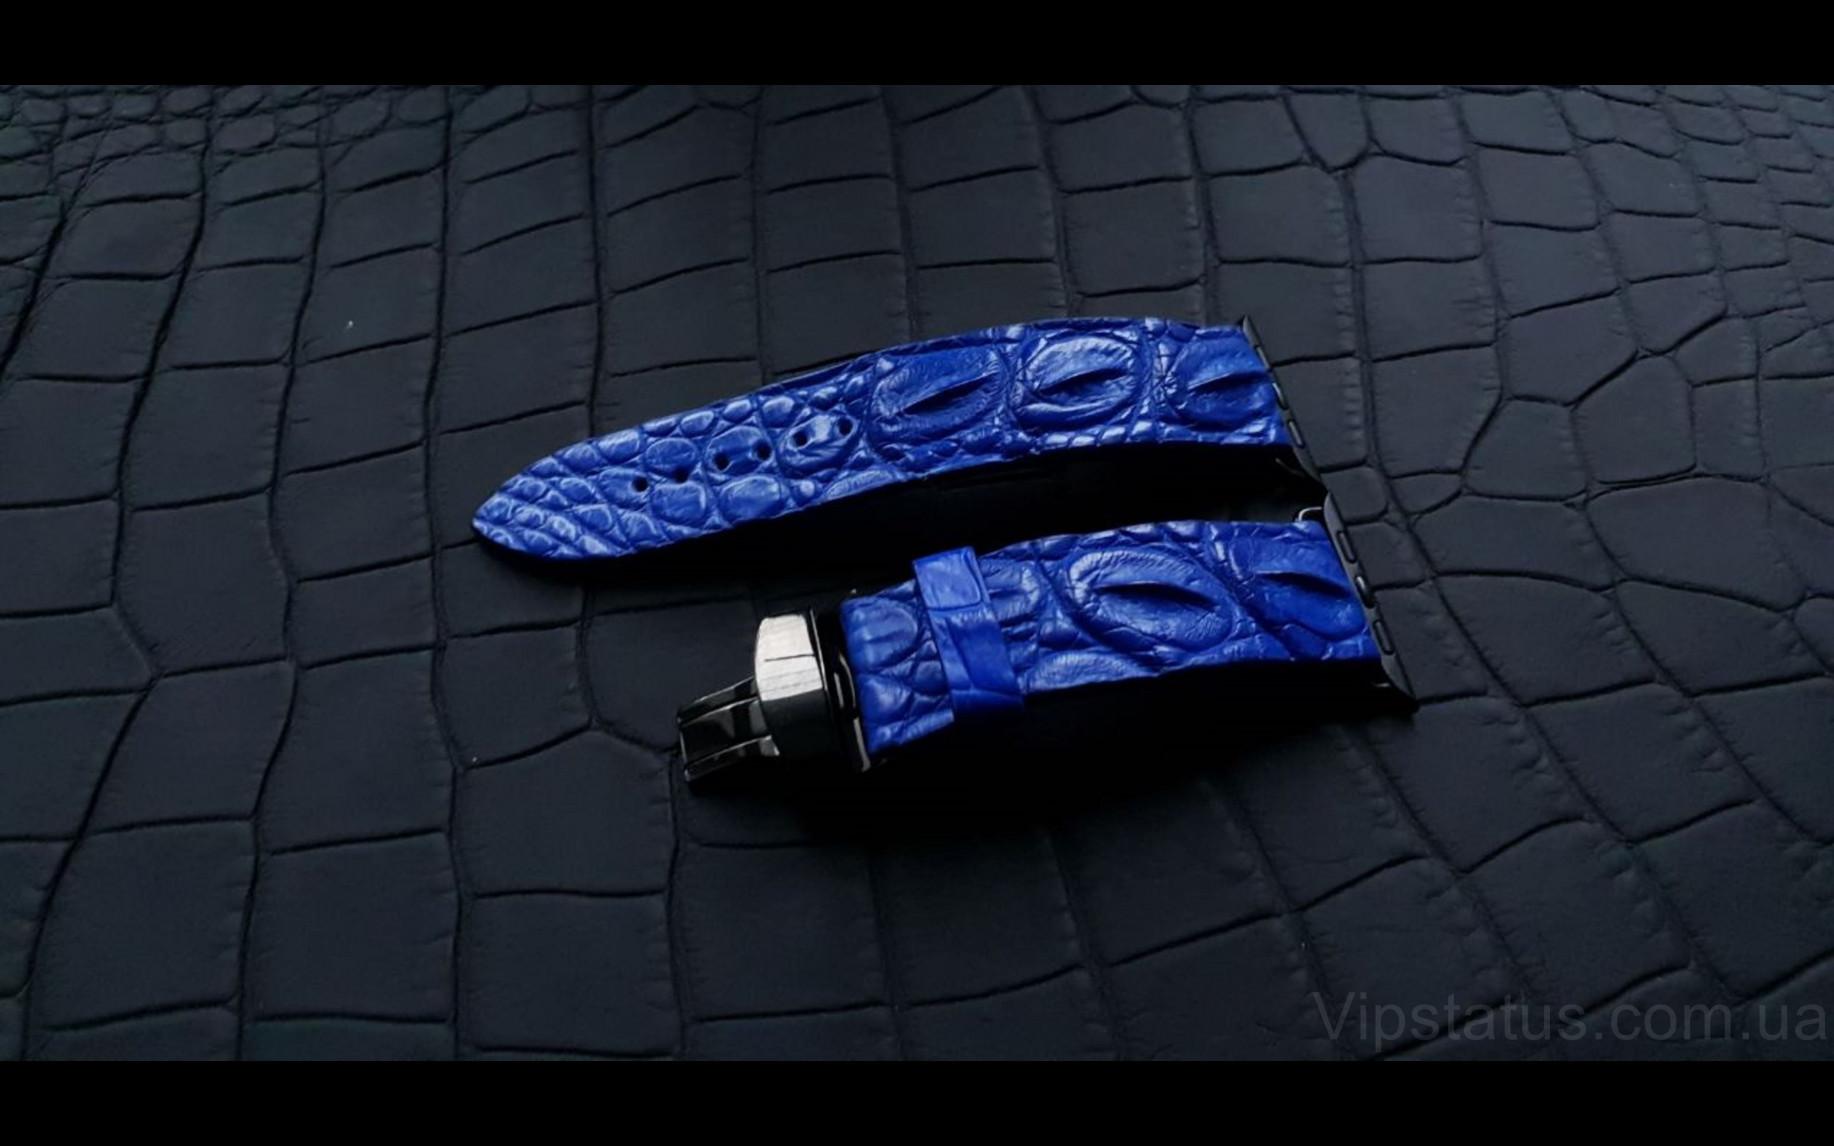 Elite Элитный ремешок для часов Blue King кожа крокодила Blue King Elite Crocodile Strap image 2